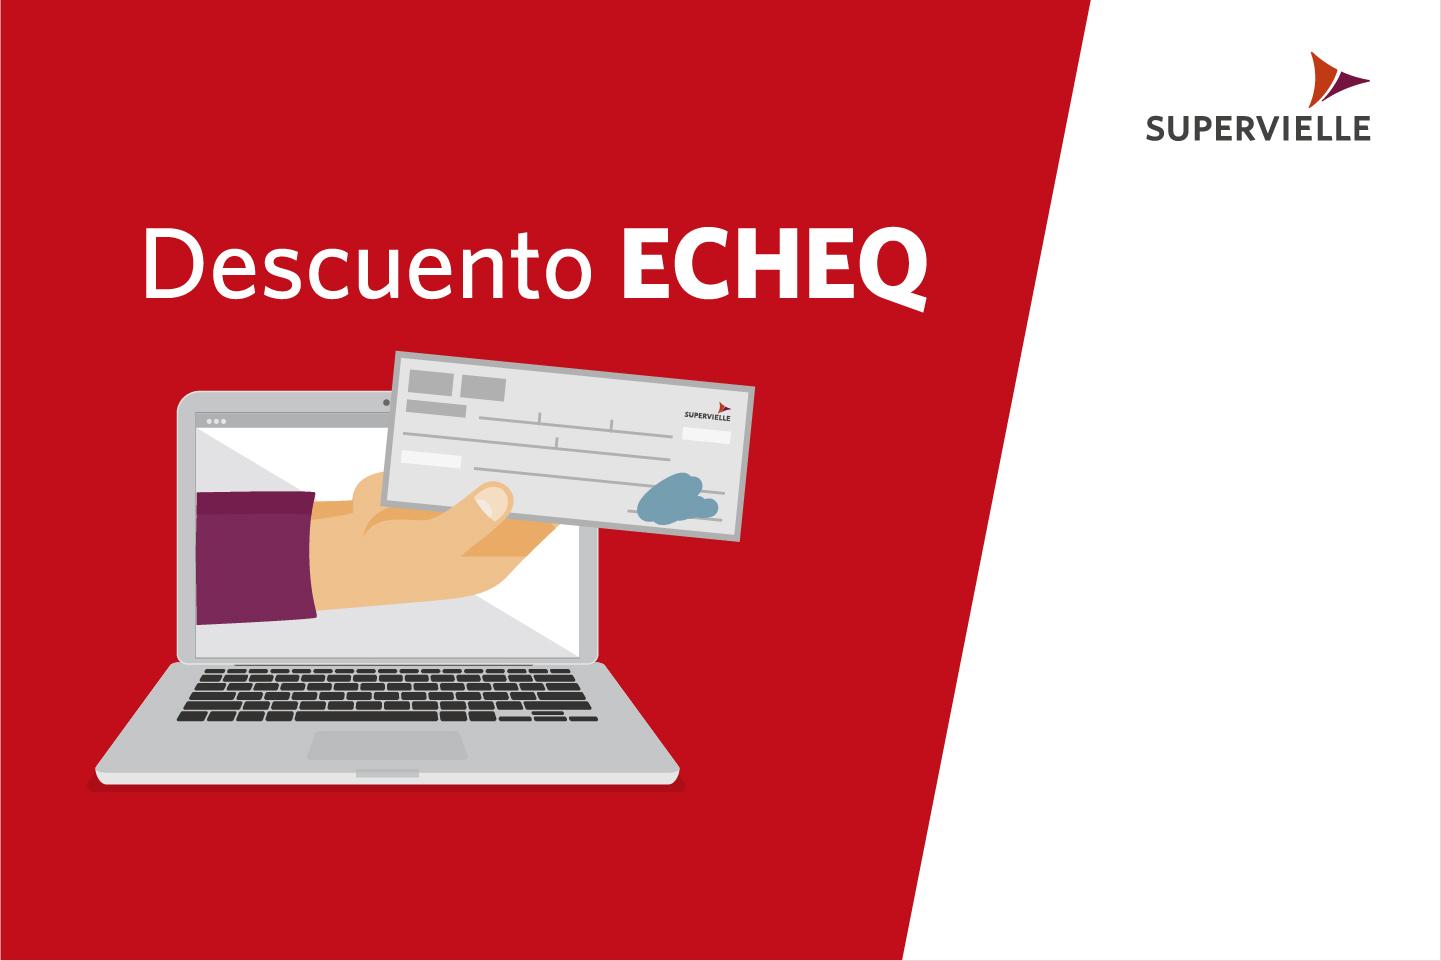 ¿Cómo descuento un ECHEQ?